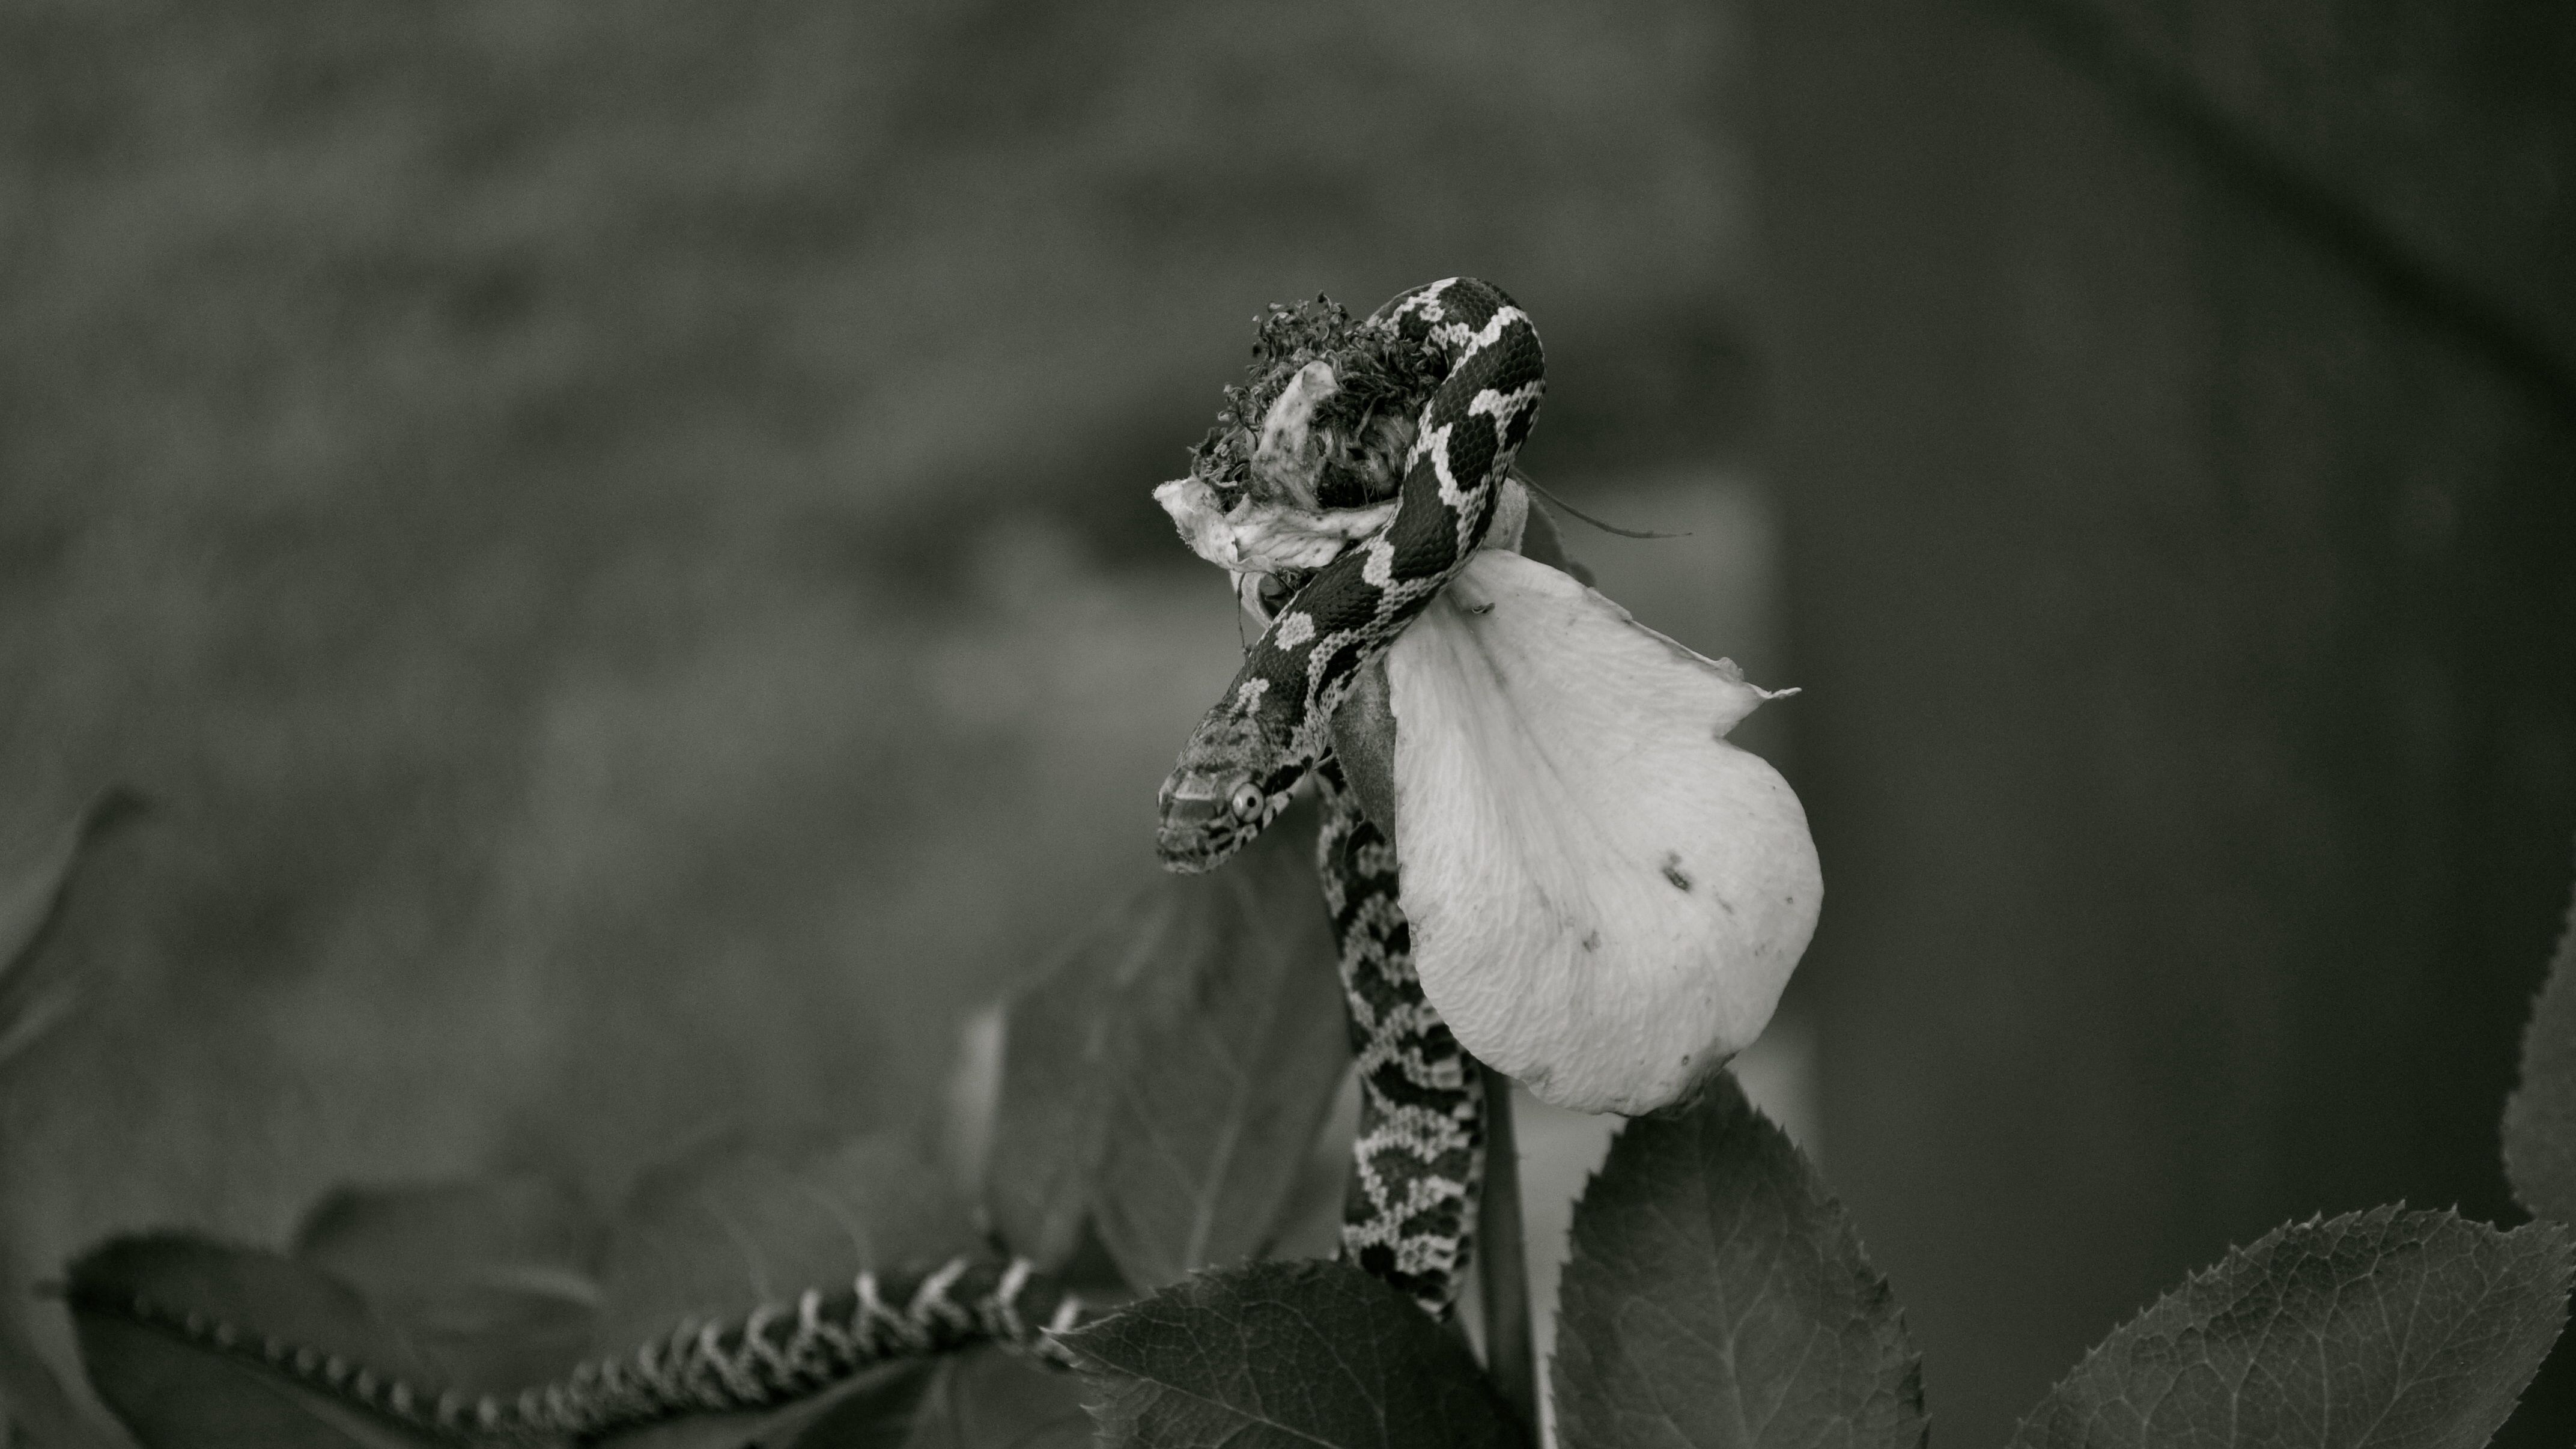 Snake on a rose petal